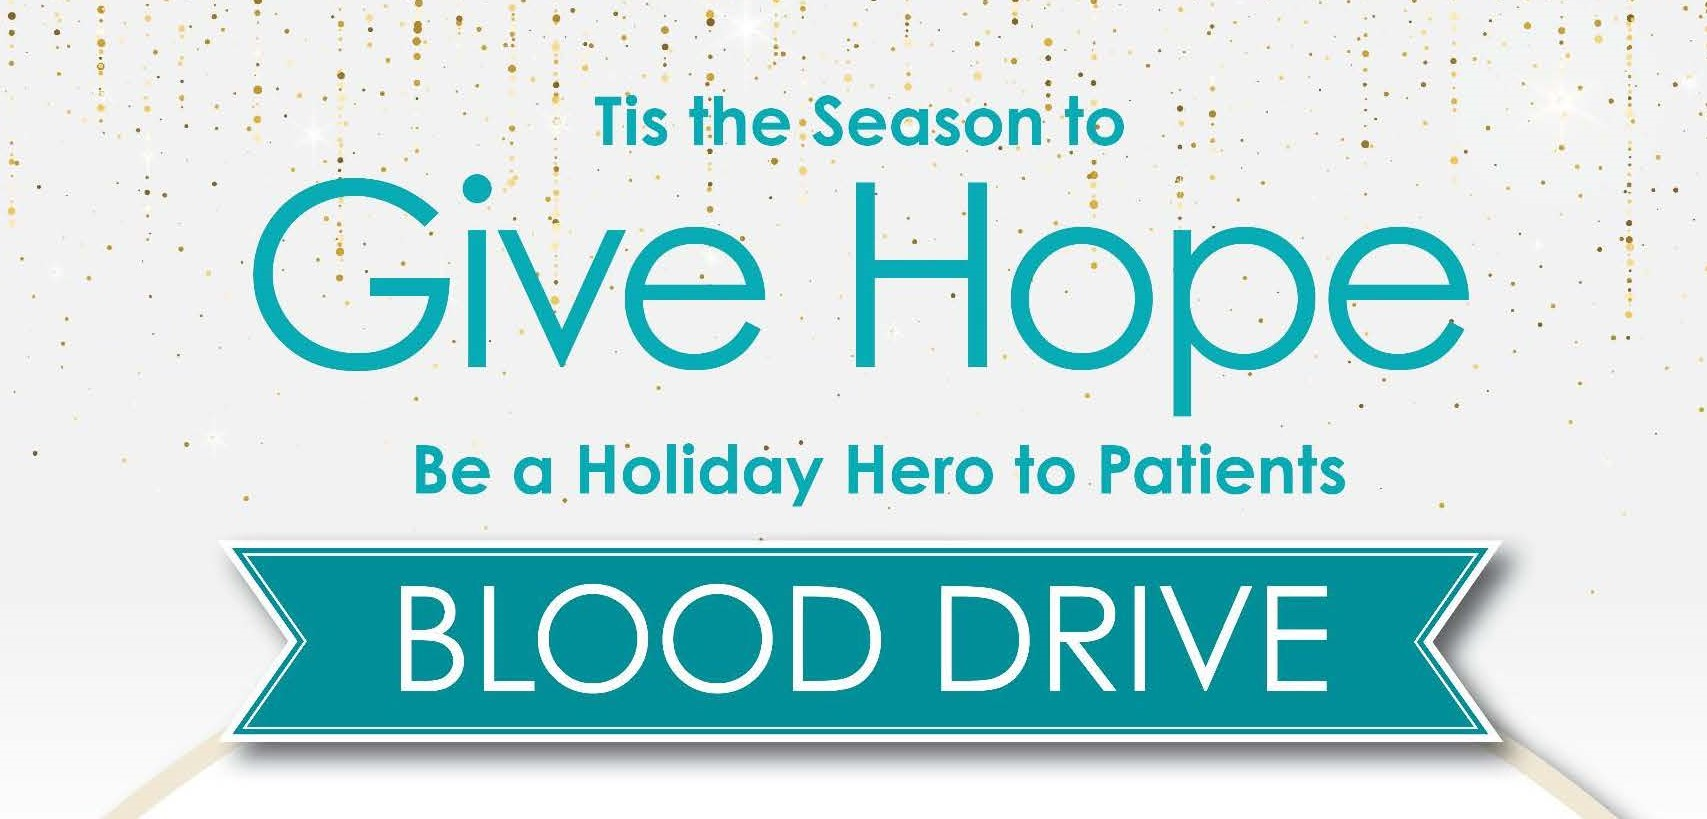 Swope Park Blood Drive #3 Flyer